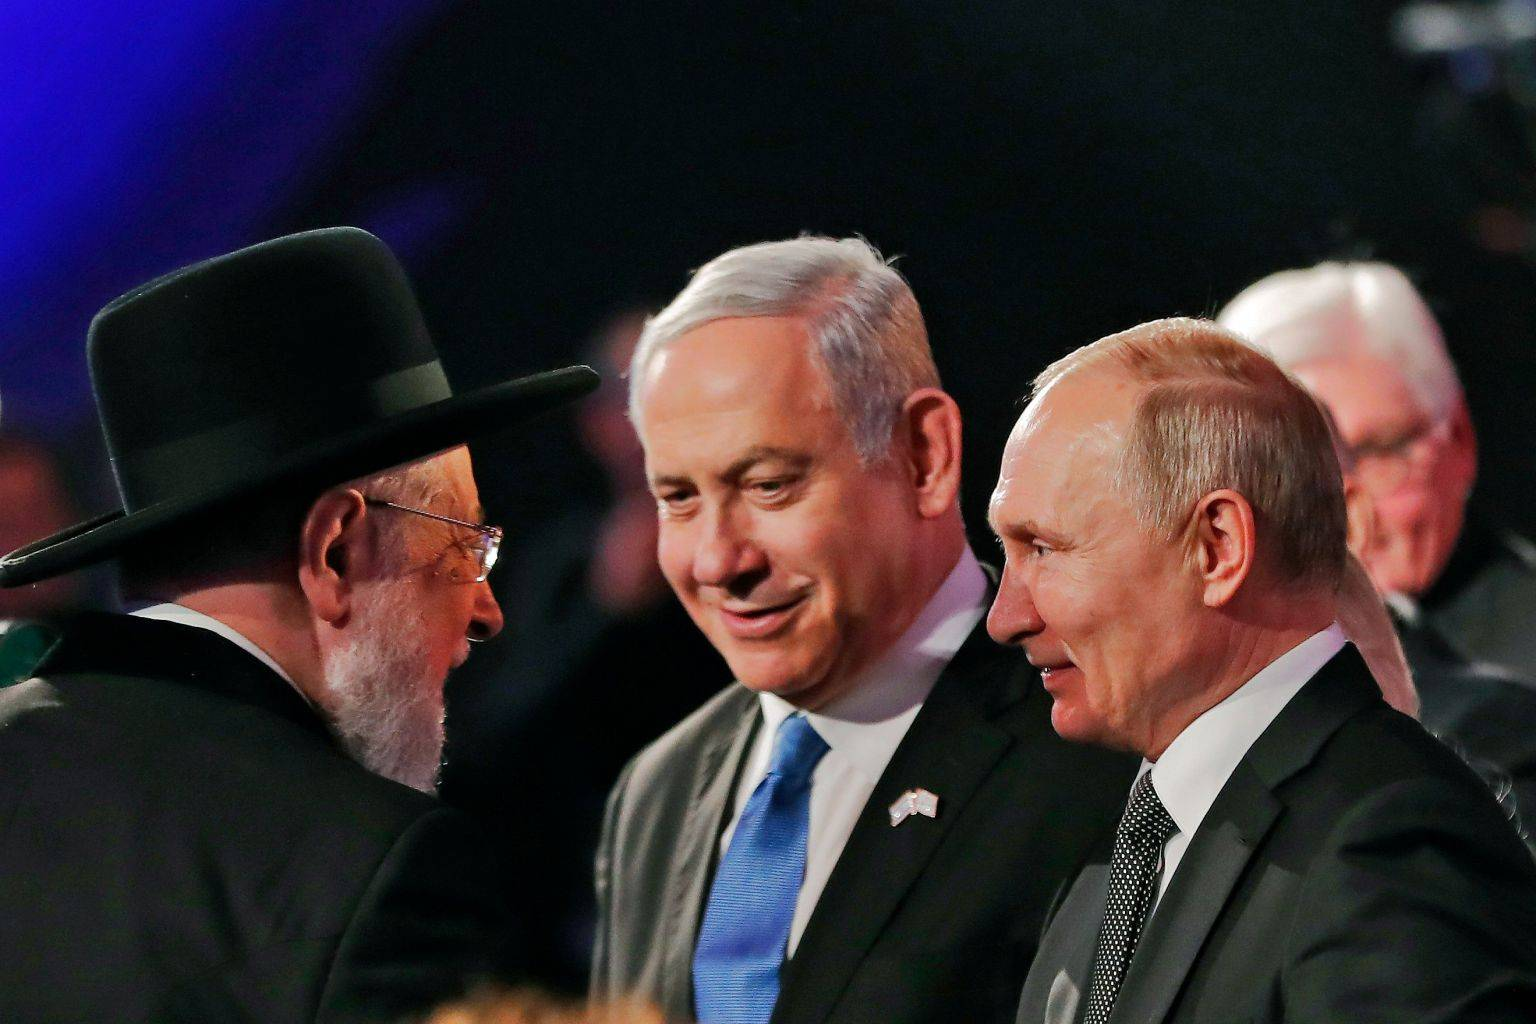 israel-history-holocaust-diplomacy-15300